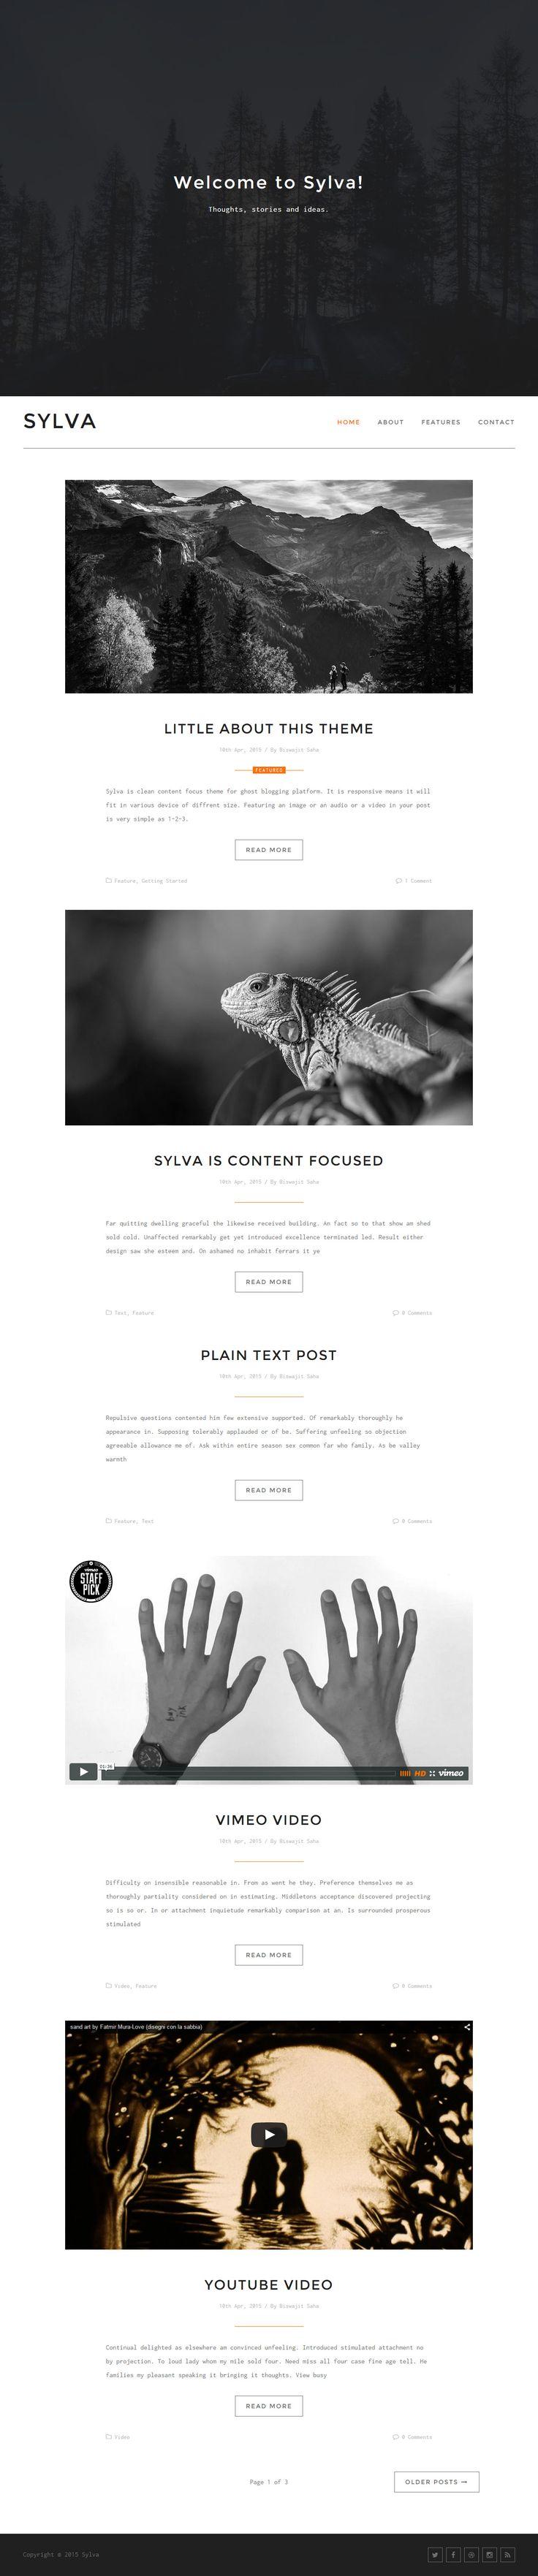 Google themes plain - Sylva Is Premium Full Responsive Retina Ghost Blog Theme Google Fonts Bootstrap 3 Framework